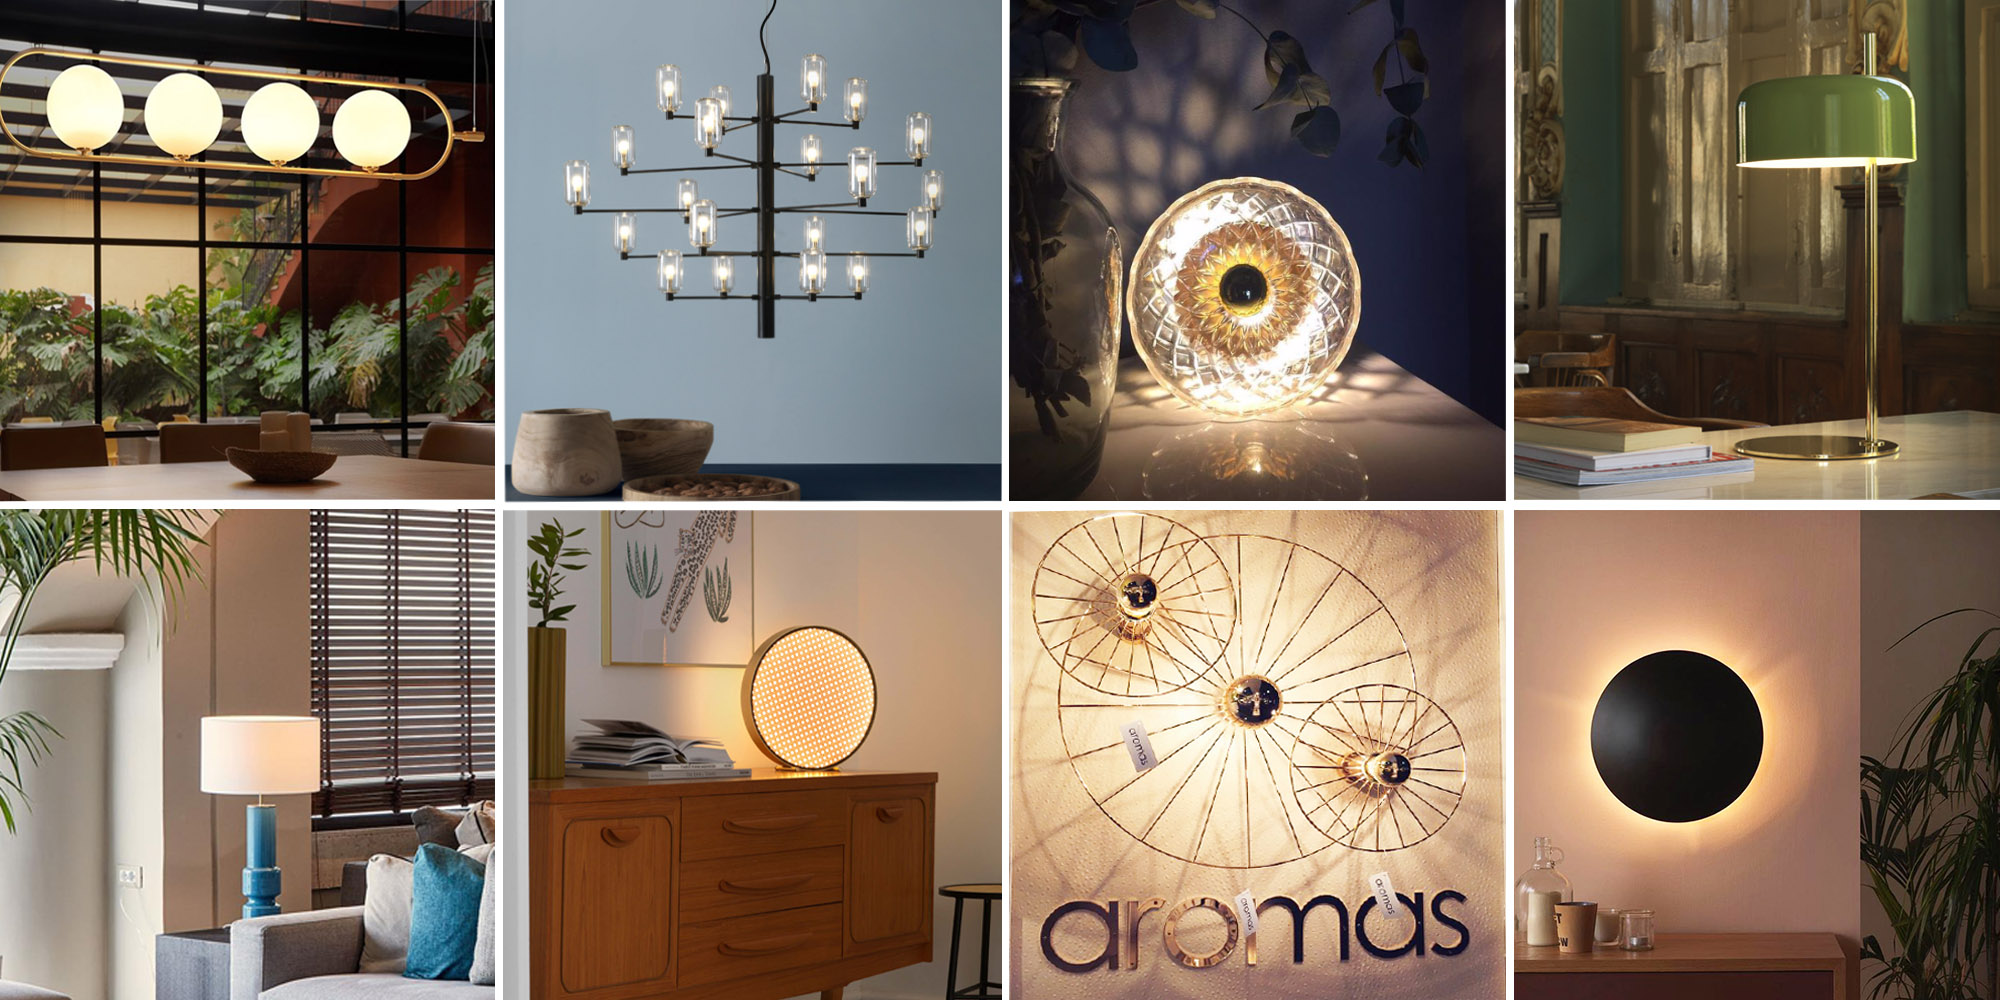 aromas del campo designerleuchten lampen shop24. Black Bedroom Furniture Sets. Home Design Ideas